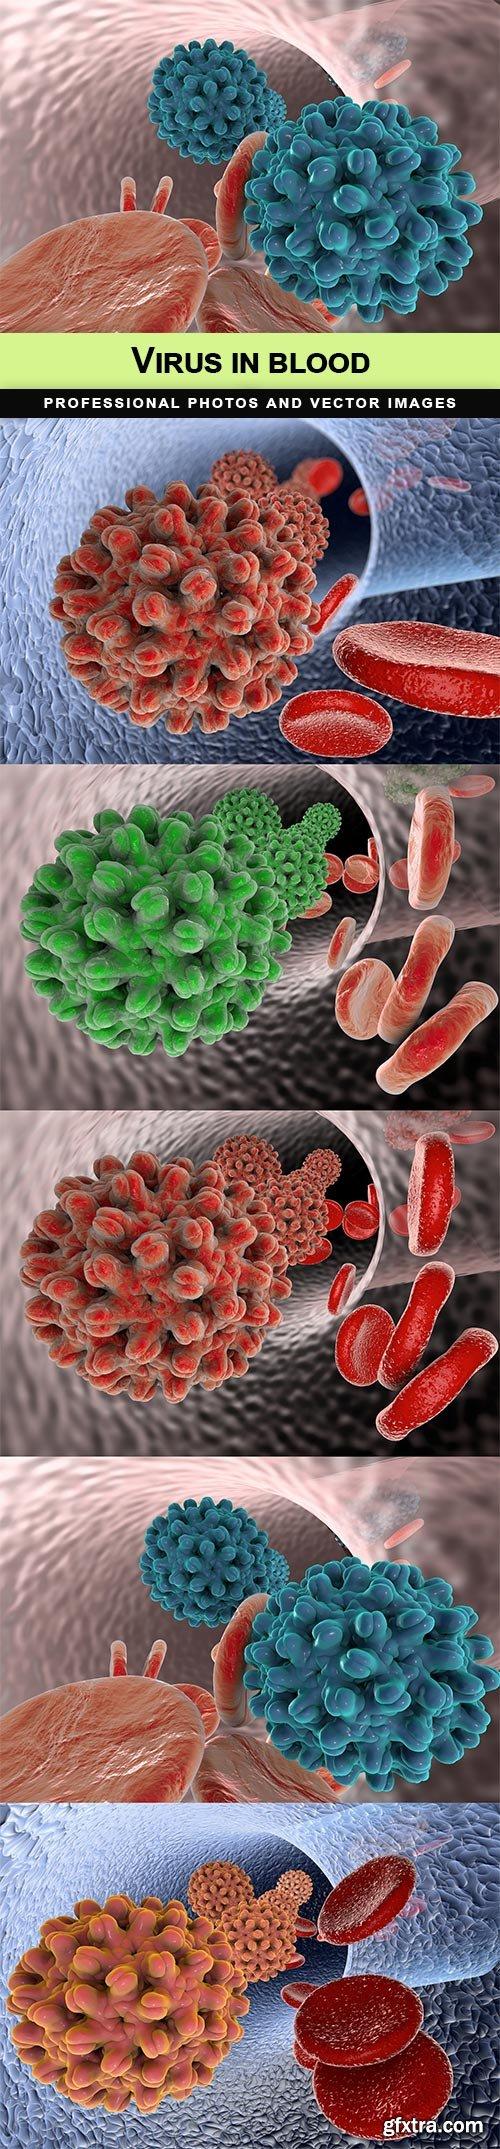 Virus in blood - 5 UHQ JPEG